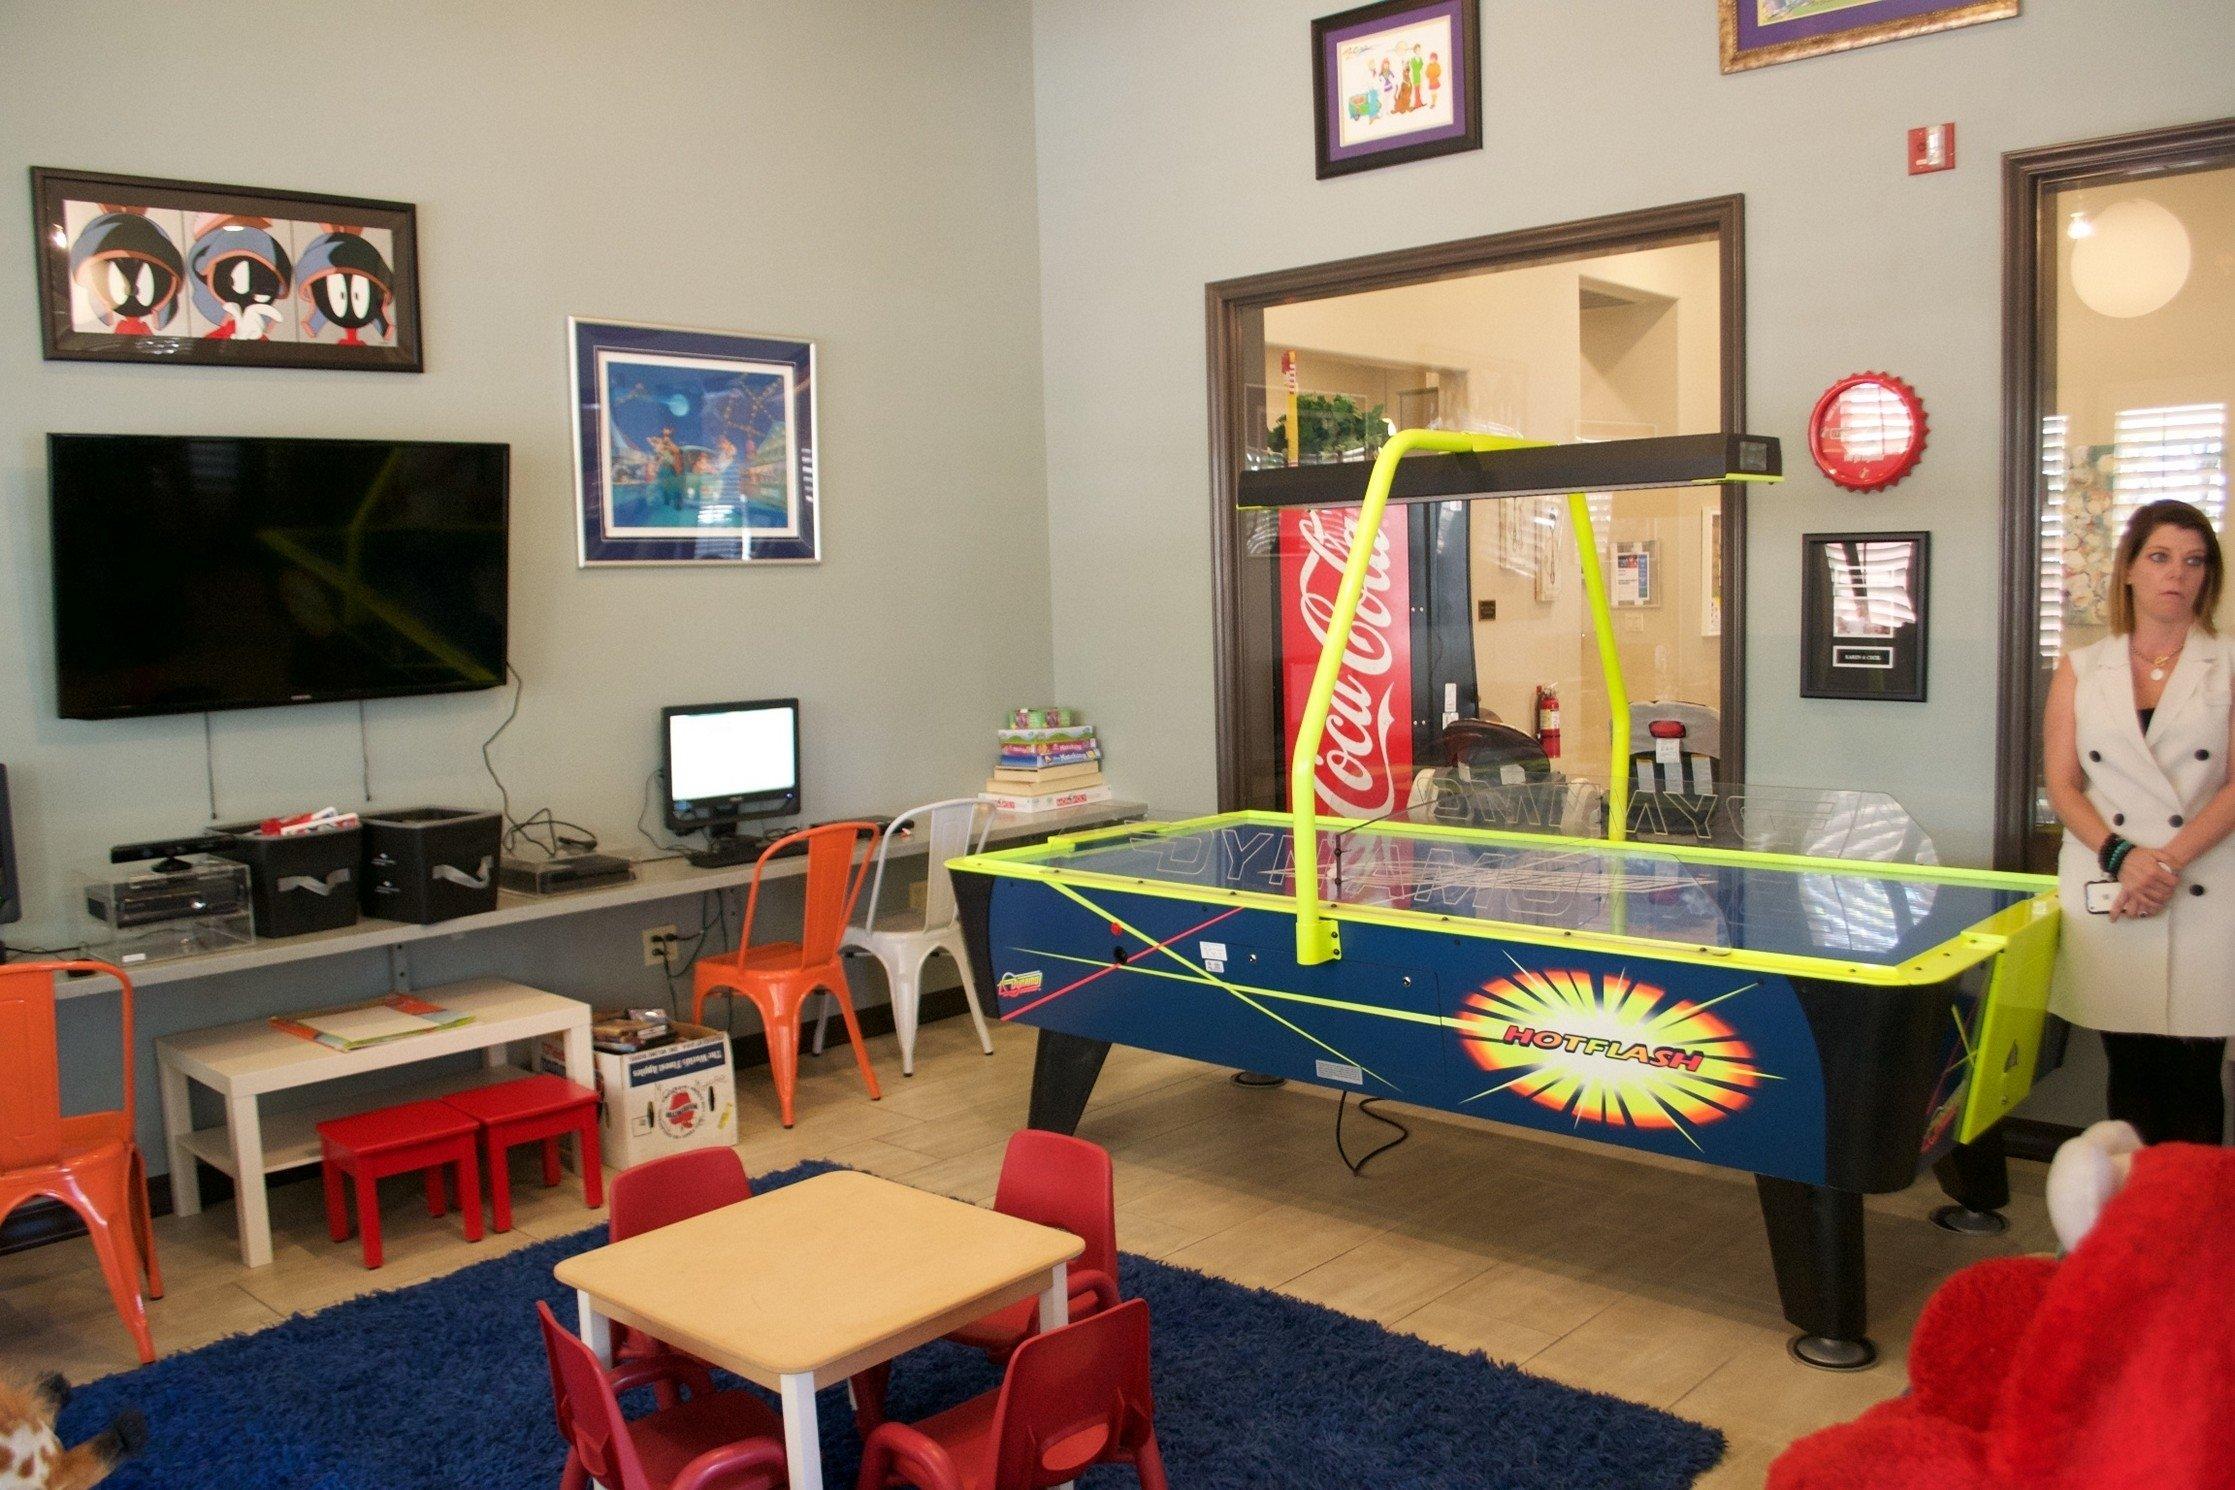 10 Nice Game Room Ideas For Teenagers teenage game room ideas for designs cool kids mesirci